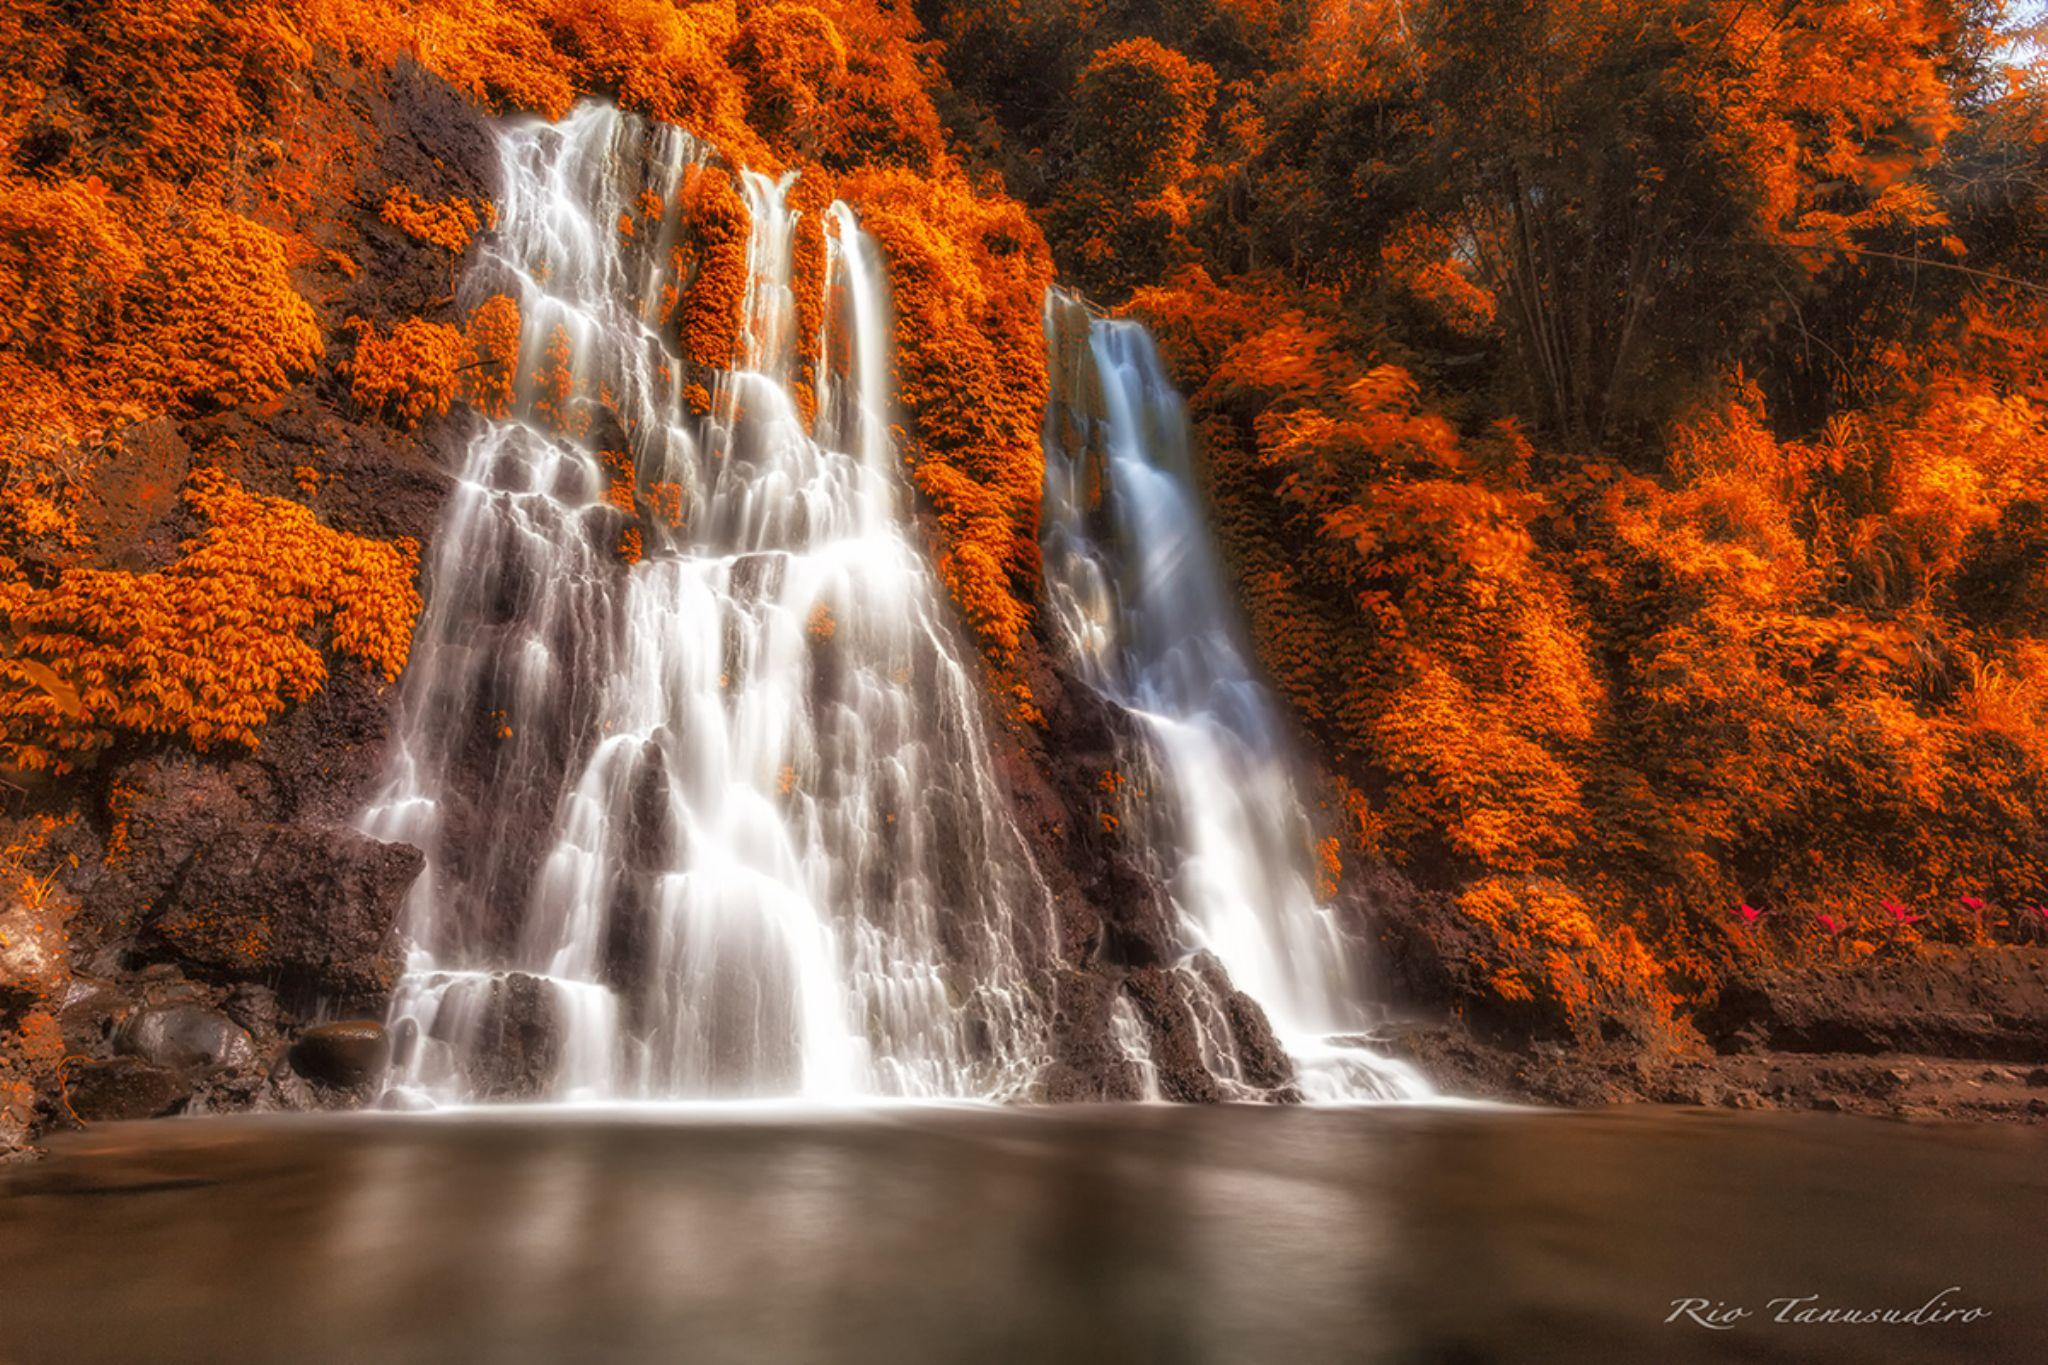 Autumn waterfall by Rio Tanusudiro